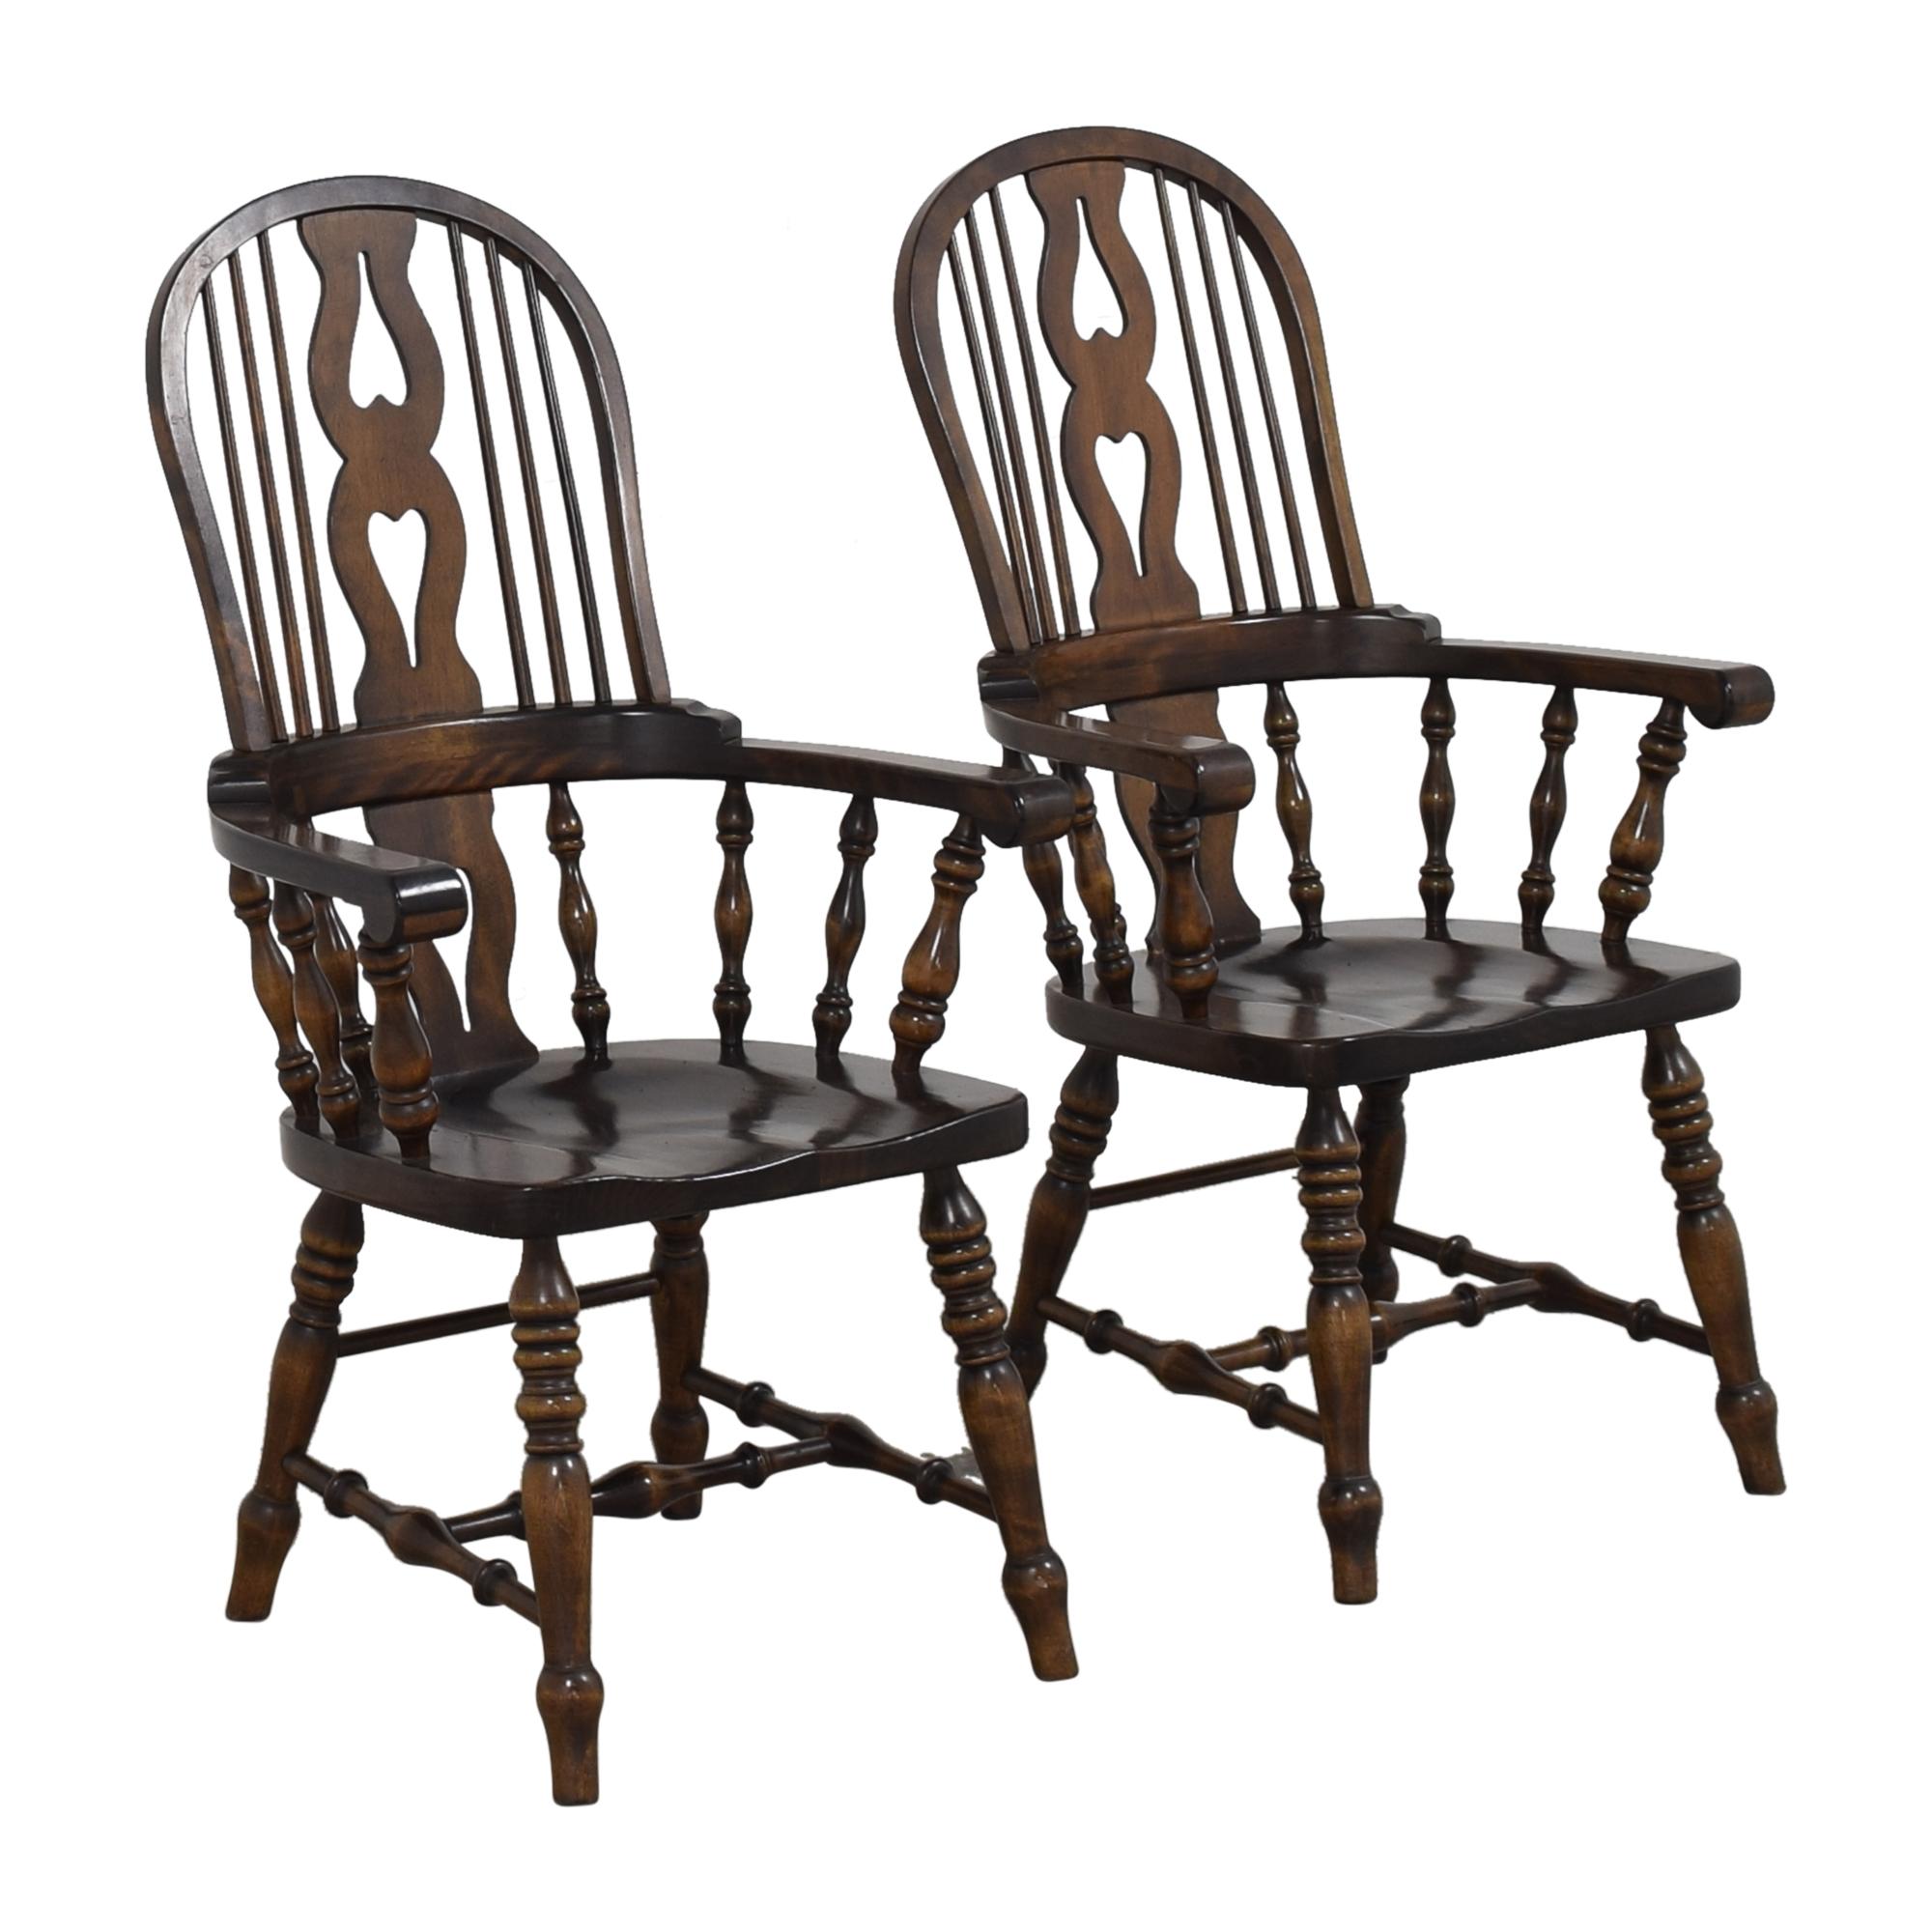 Bennington Pine Bennington Pine Vintage Windsor-Style Arm Chairs second hand